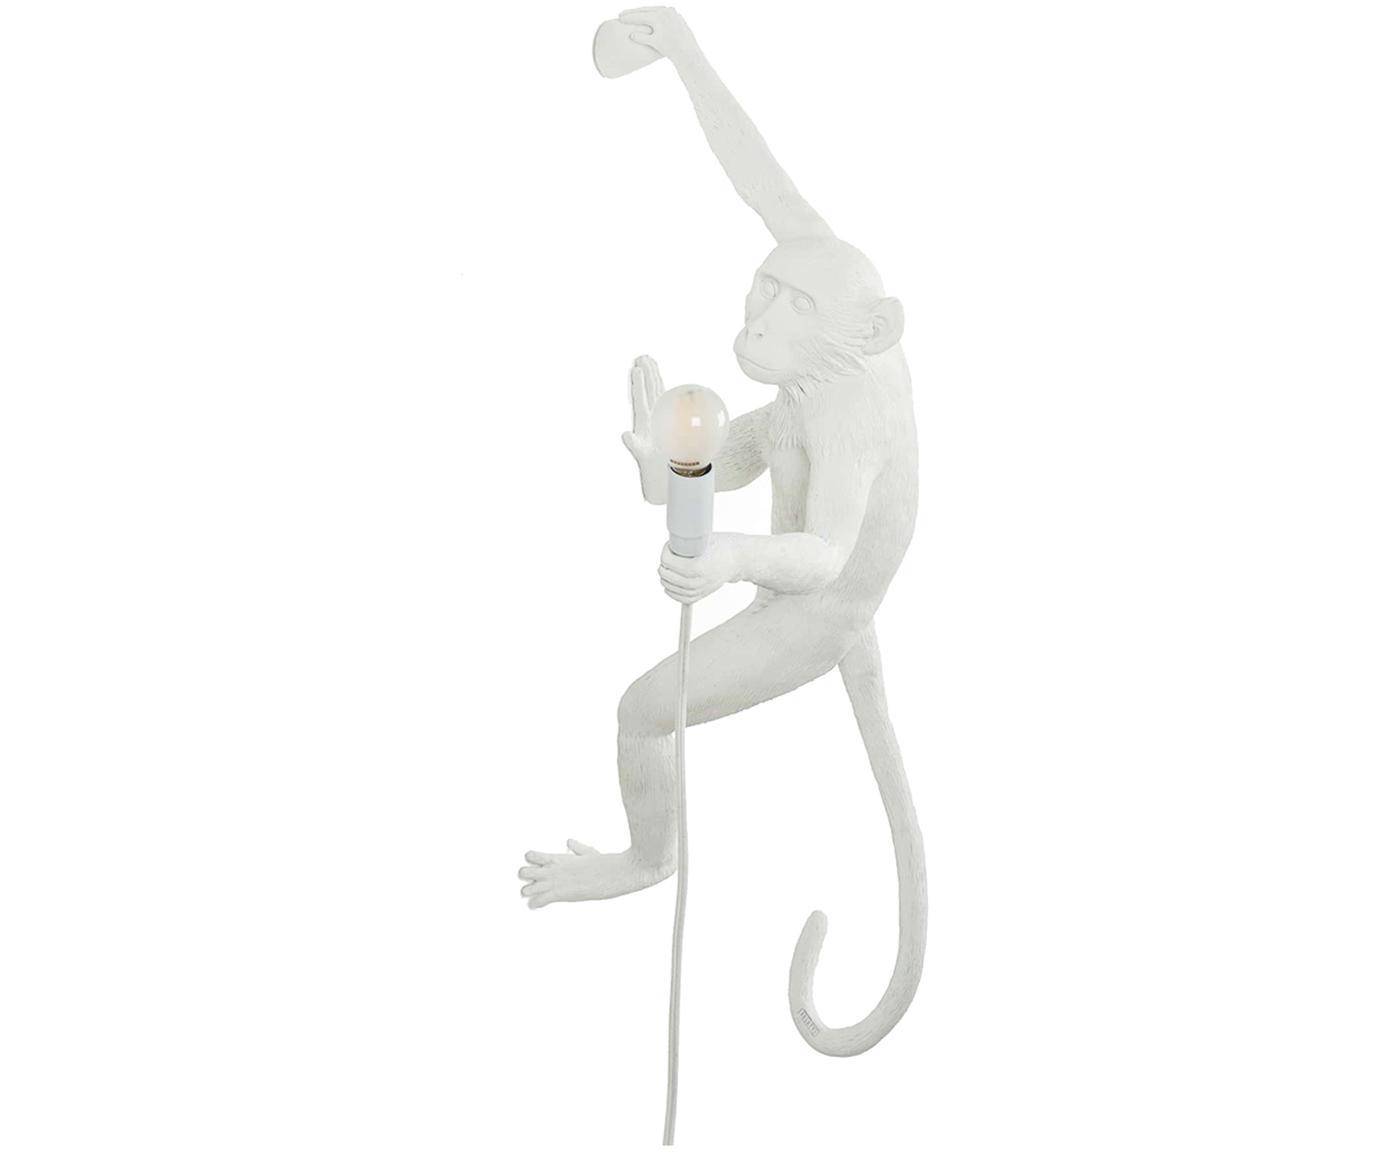 Aplique The Monkey, con enchufe, Poliresina, Blanco, An 21 x Al 77 cm